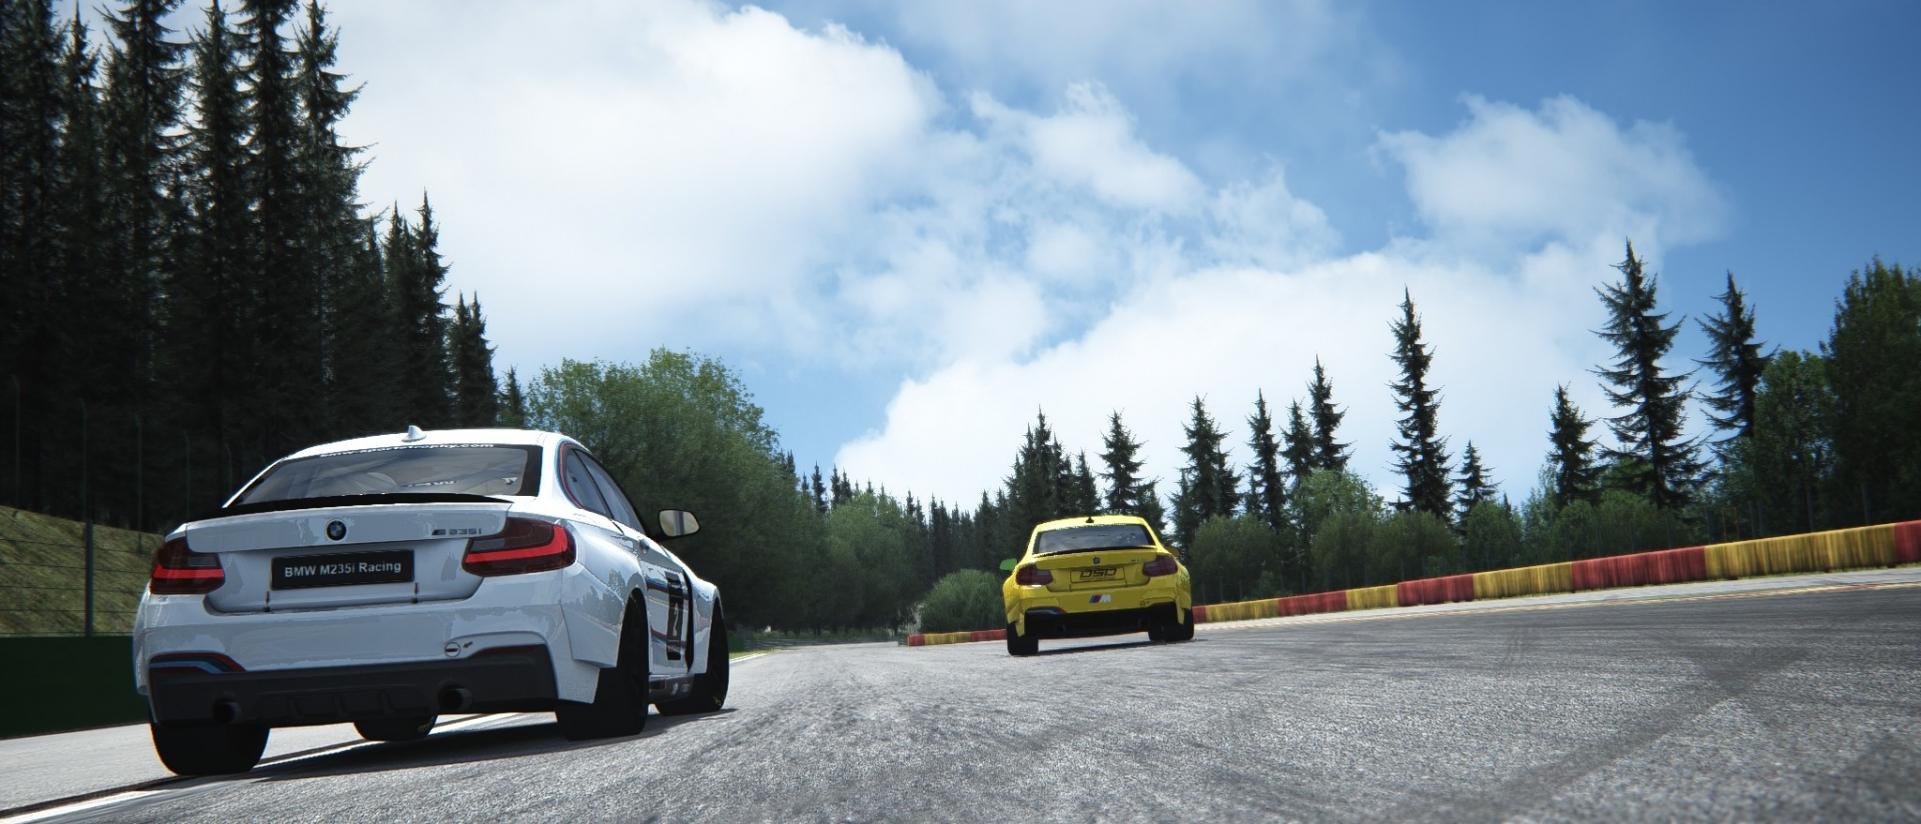 Assetto Corsa - BMW Battle 03